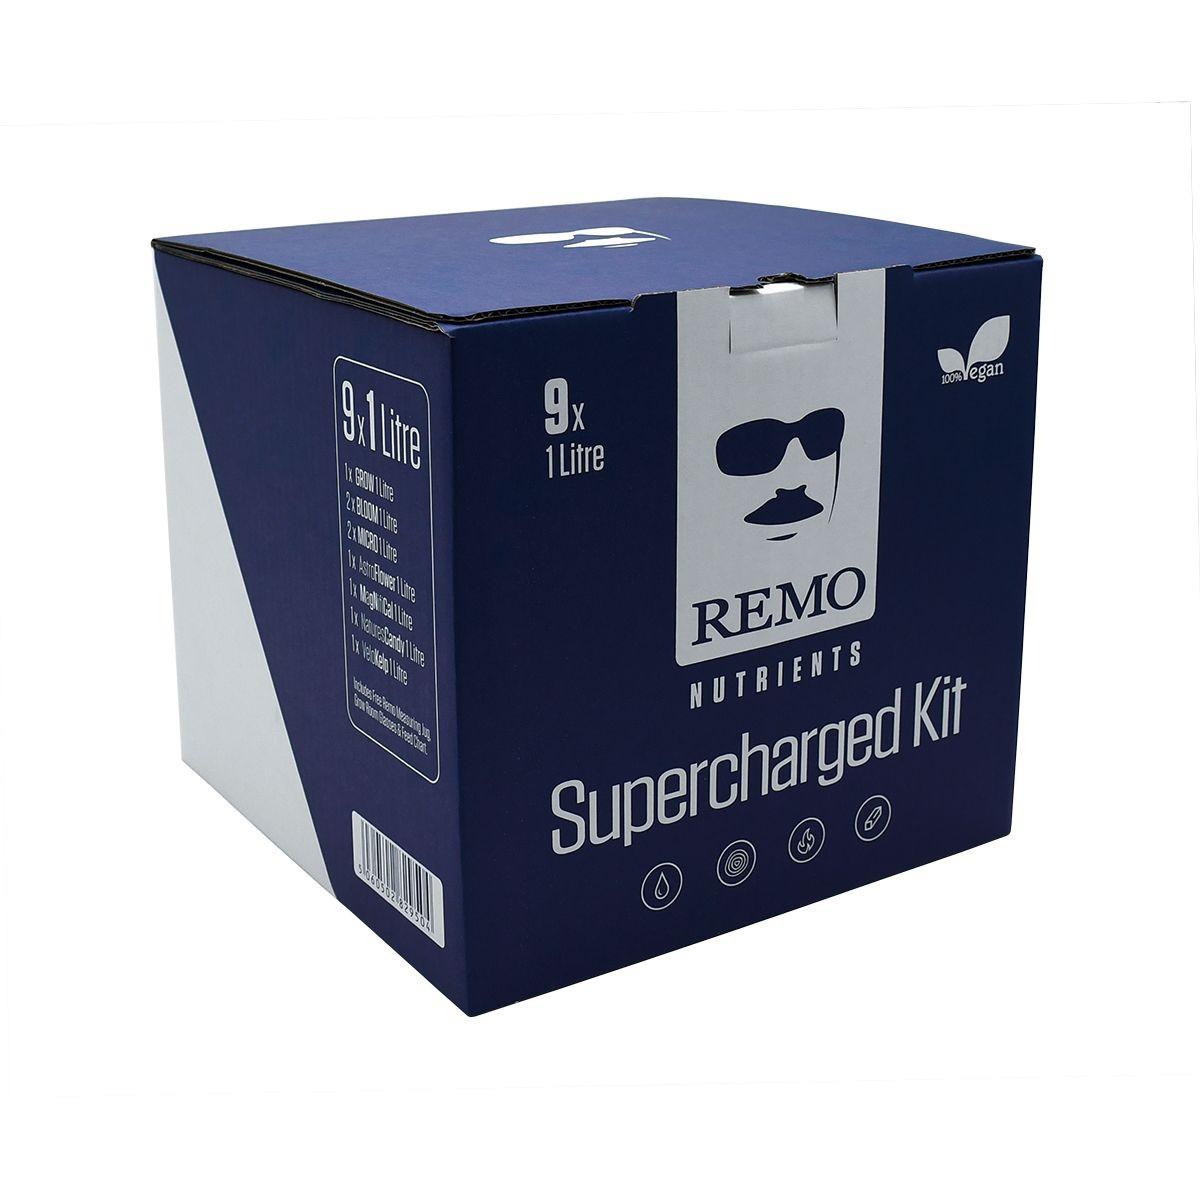 REMO SUPERCHARGED STARTER KIT 1 LITRE